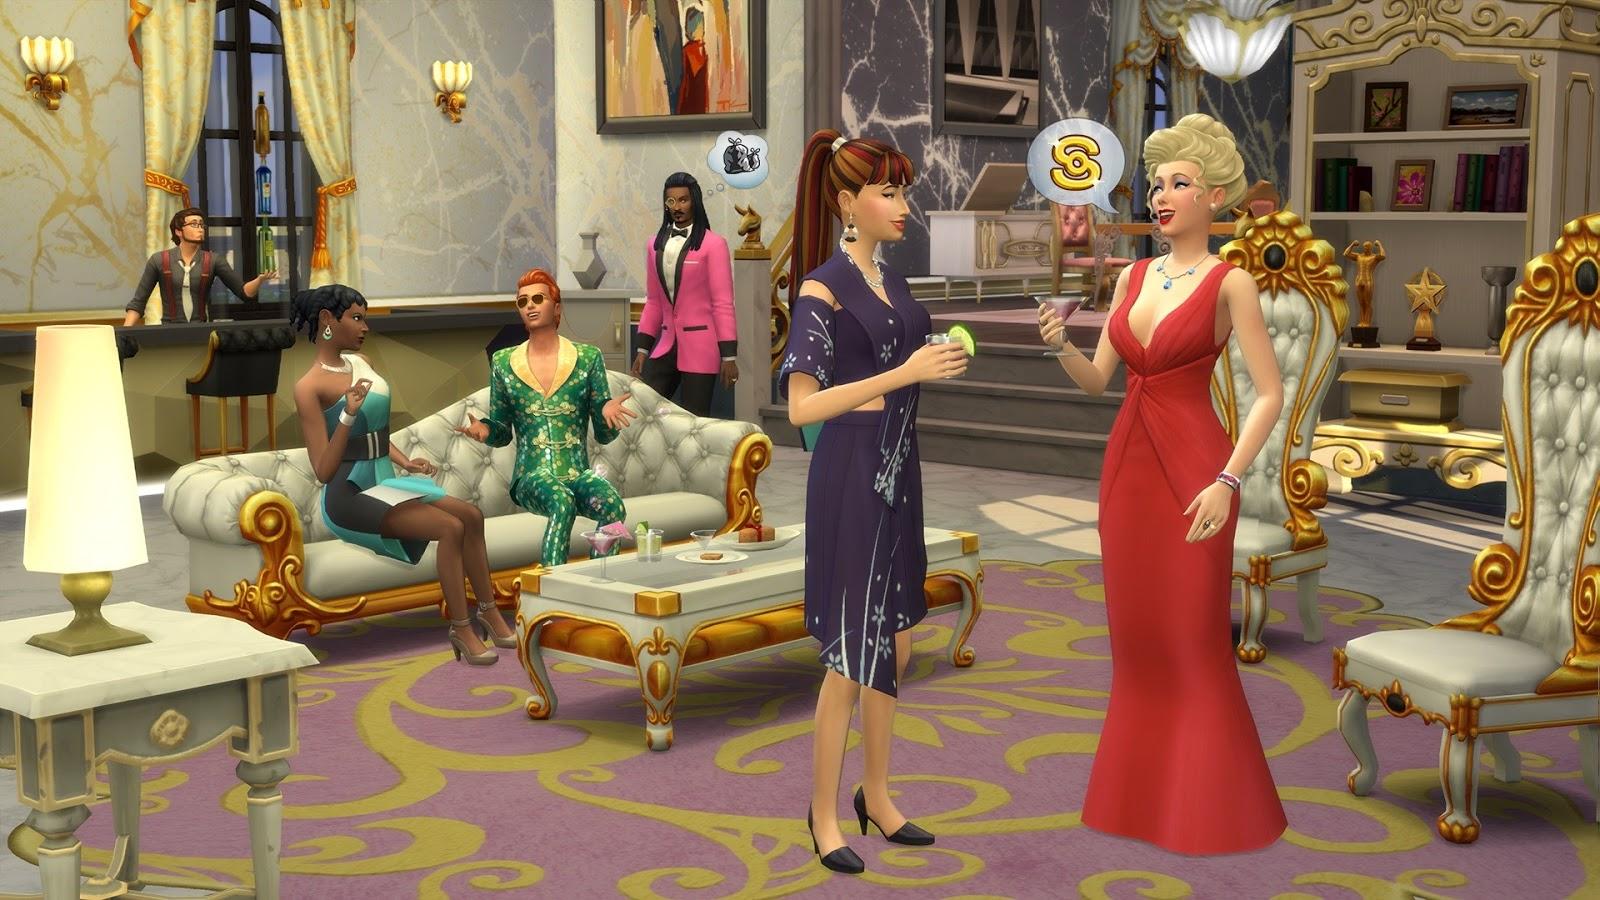 Los Sims 4 Rumbo A La Fama PC ESPAÑOL + Updates (CODEX) 4